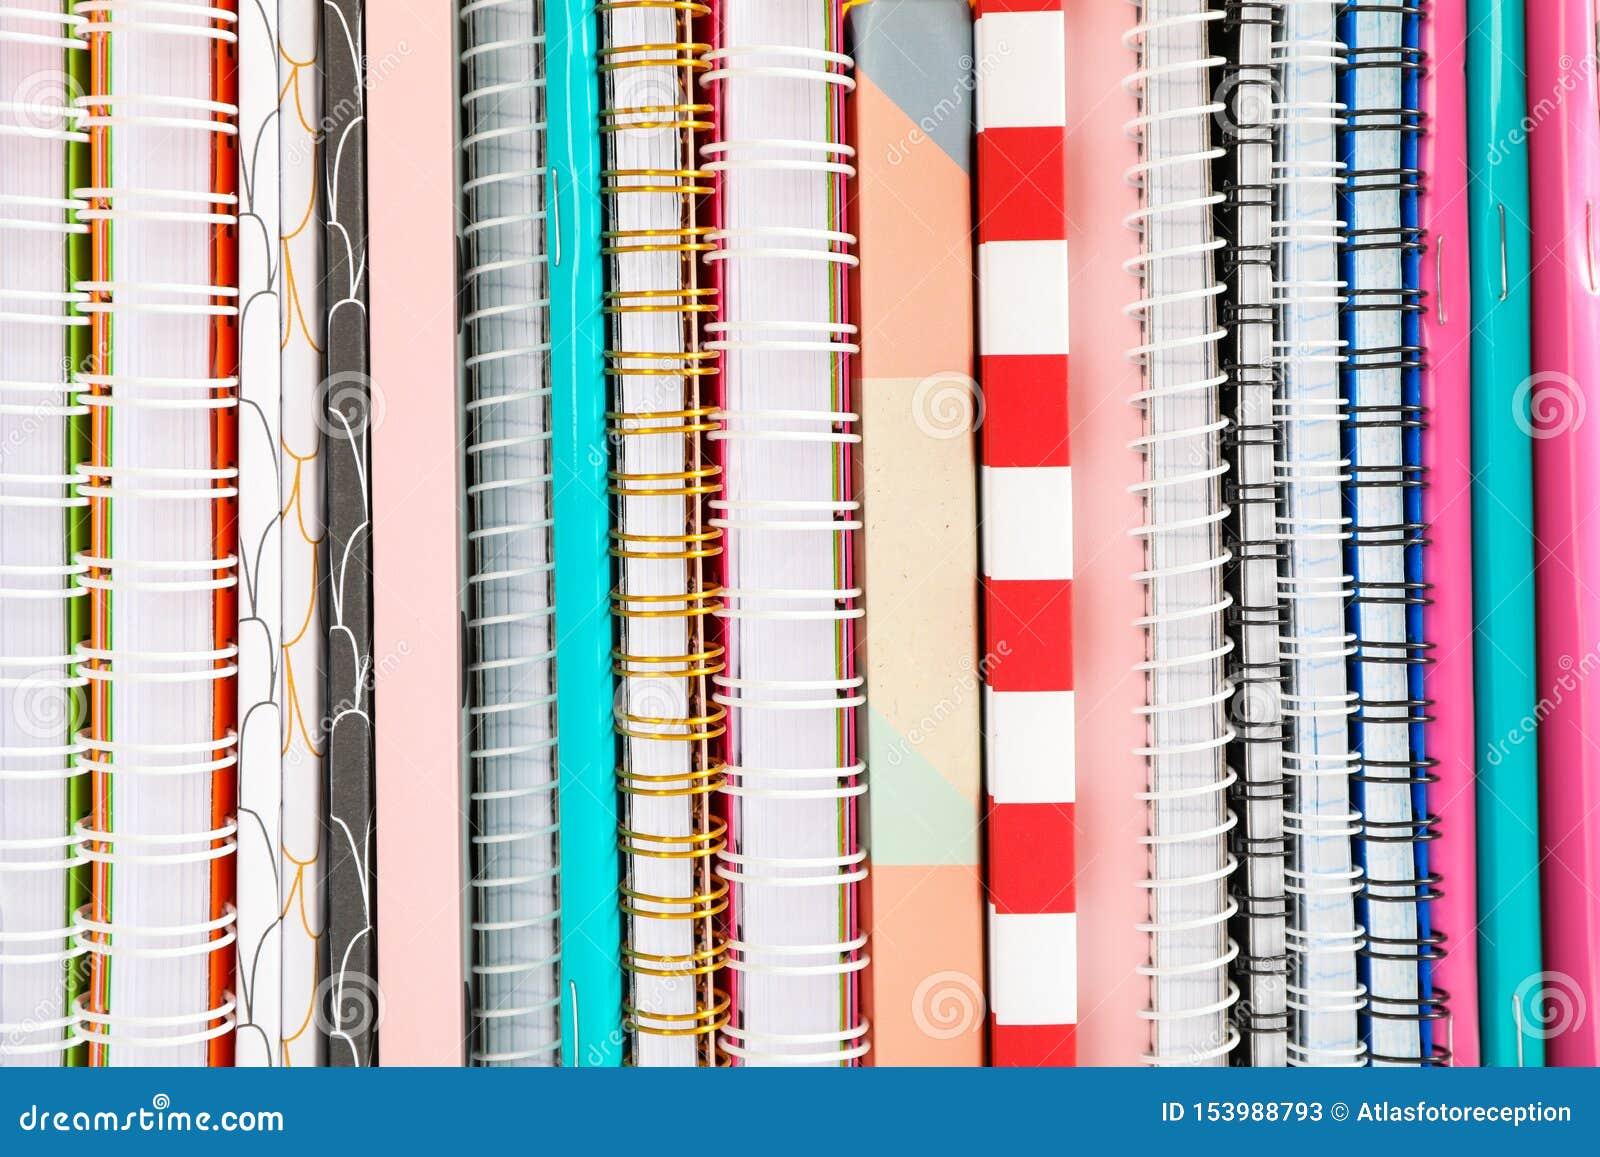 Sterta kolorowe książki i copybooks jako tło